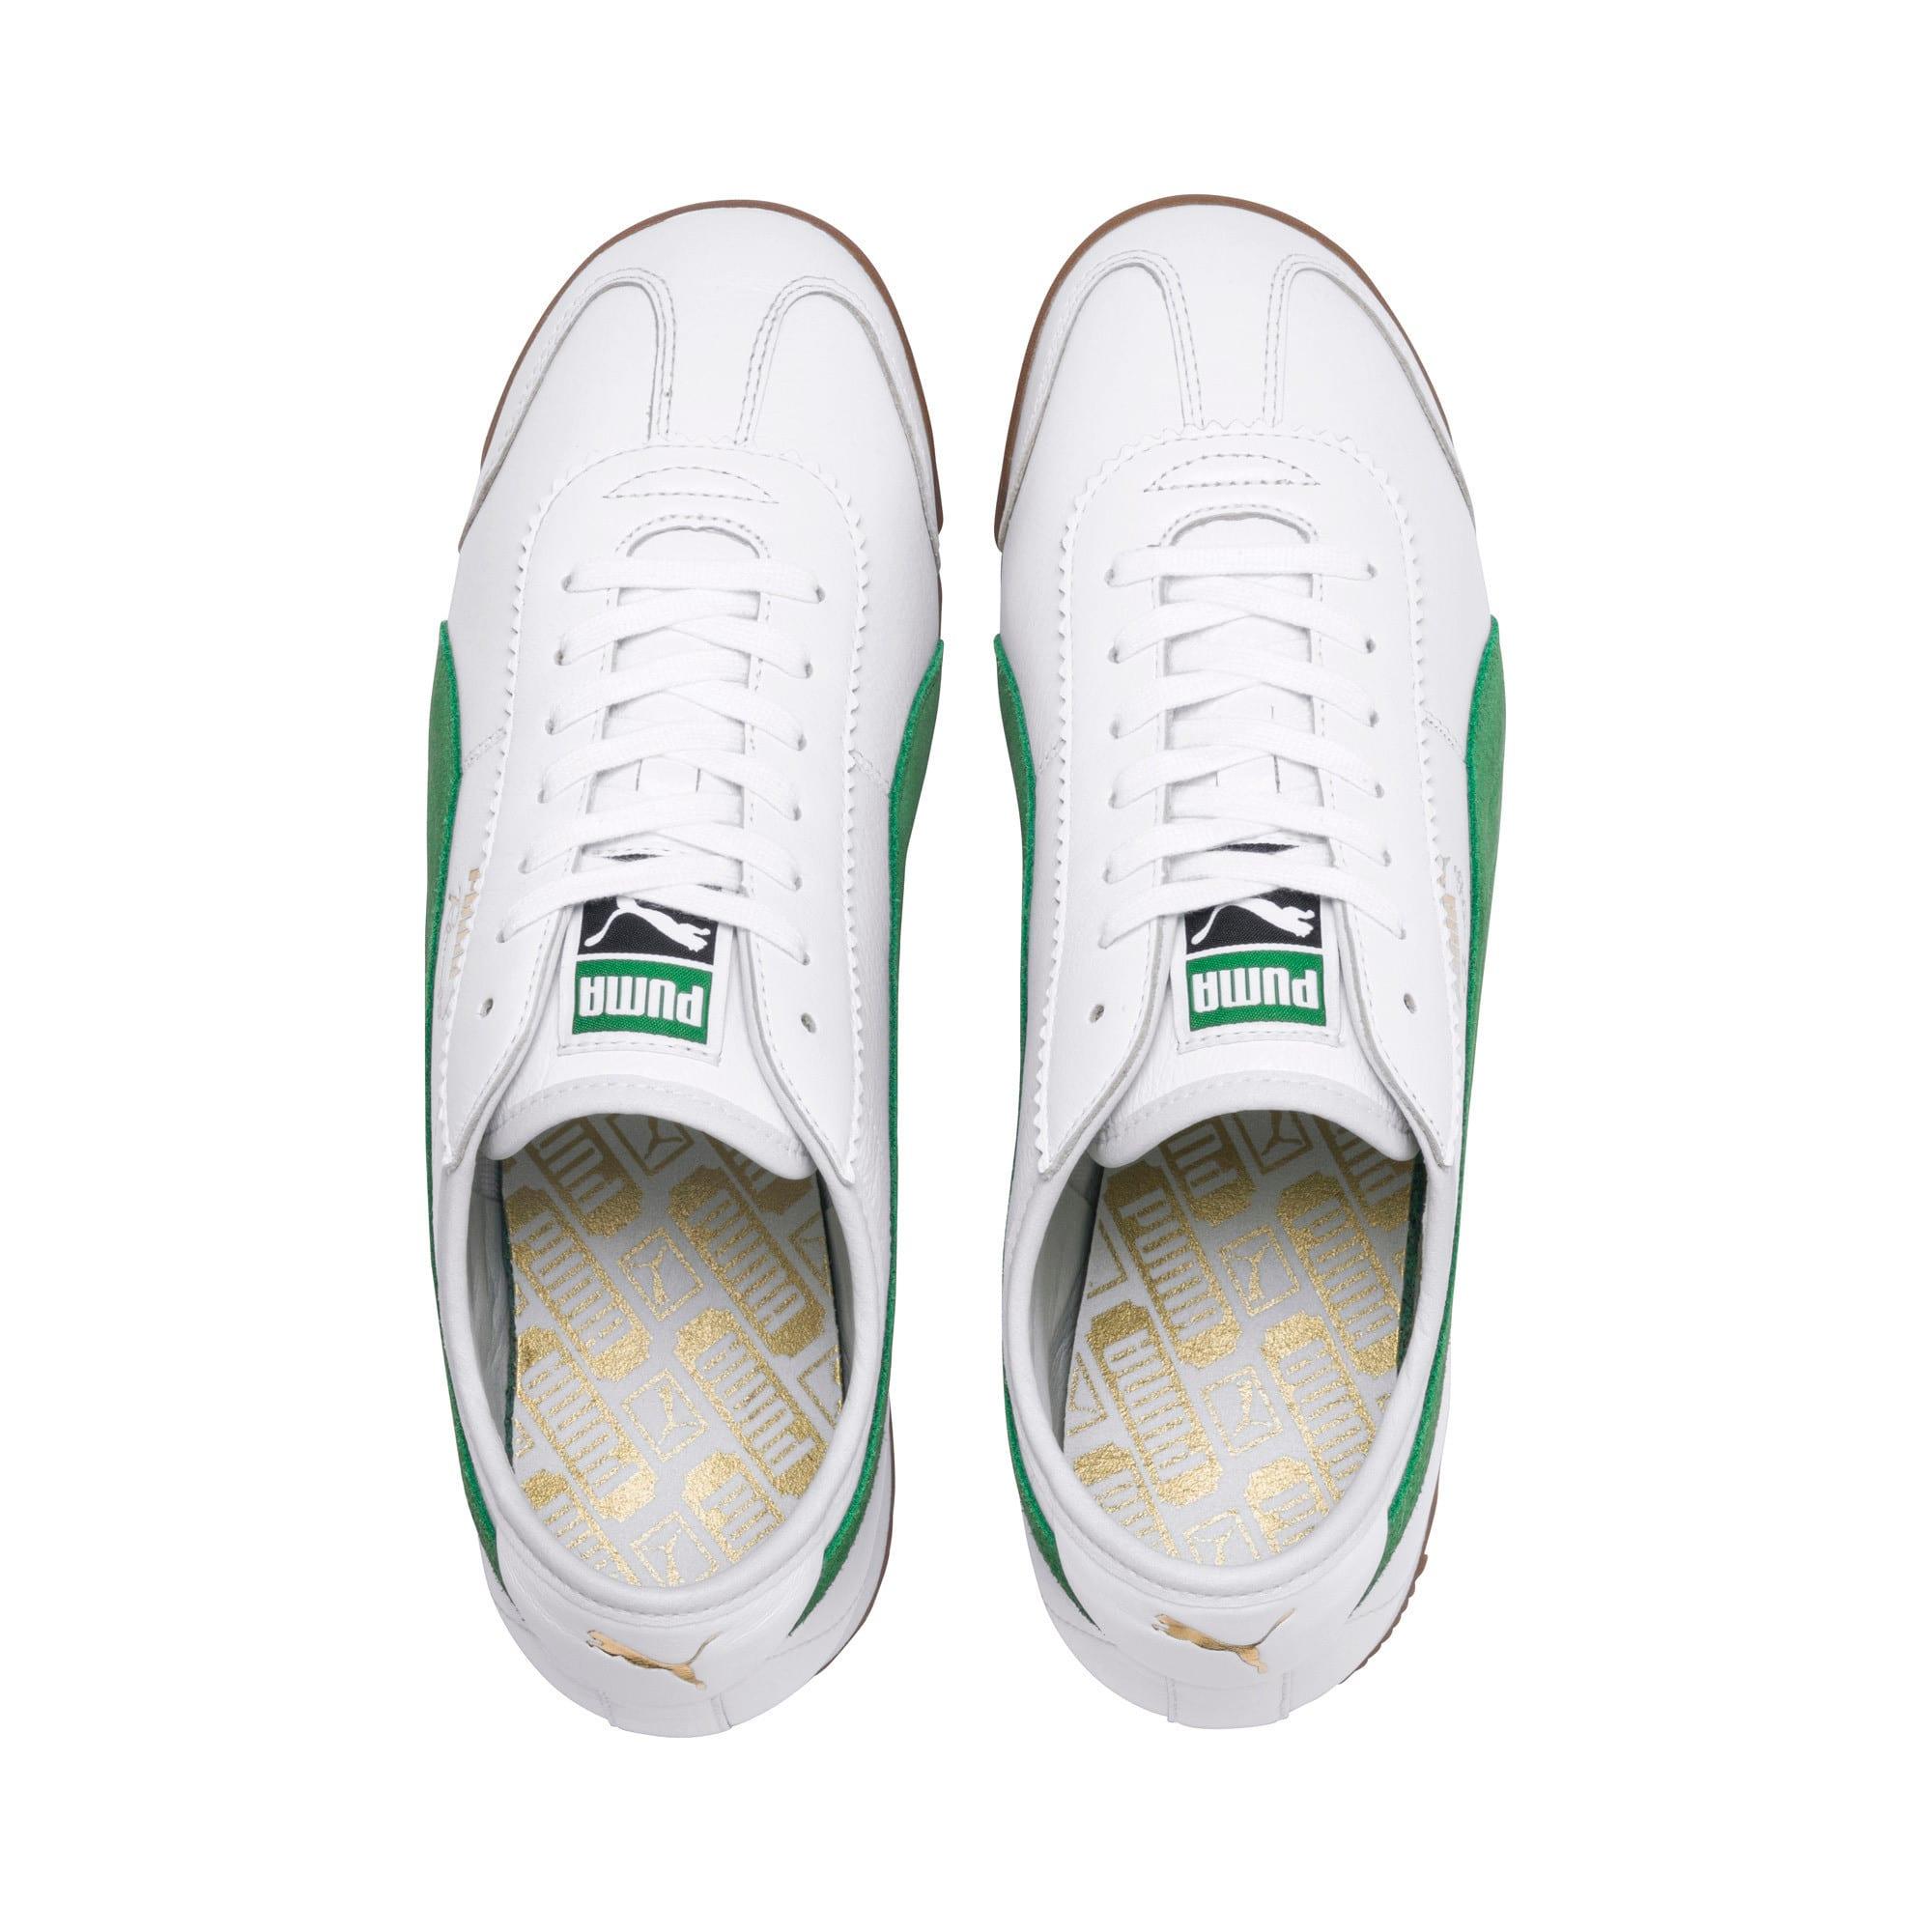 Thumbnail 7 of Roma '68 OG Sneakers, Puma White-Amazon Green, medium